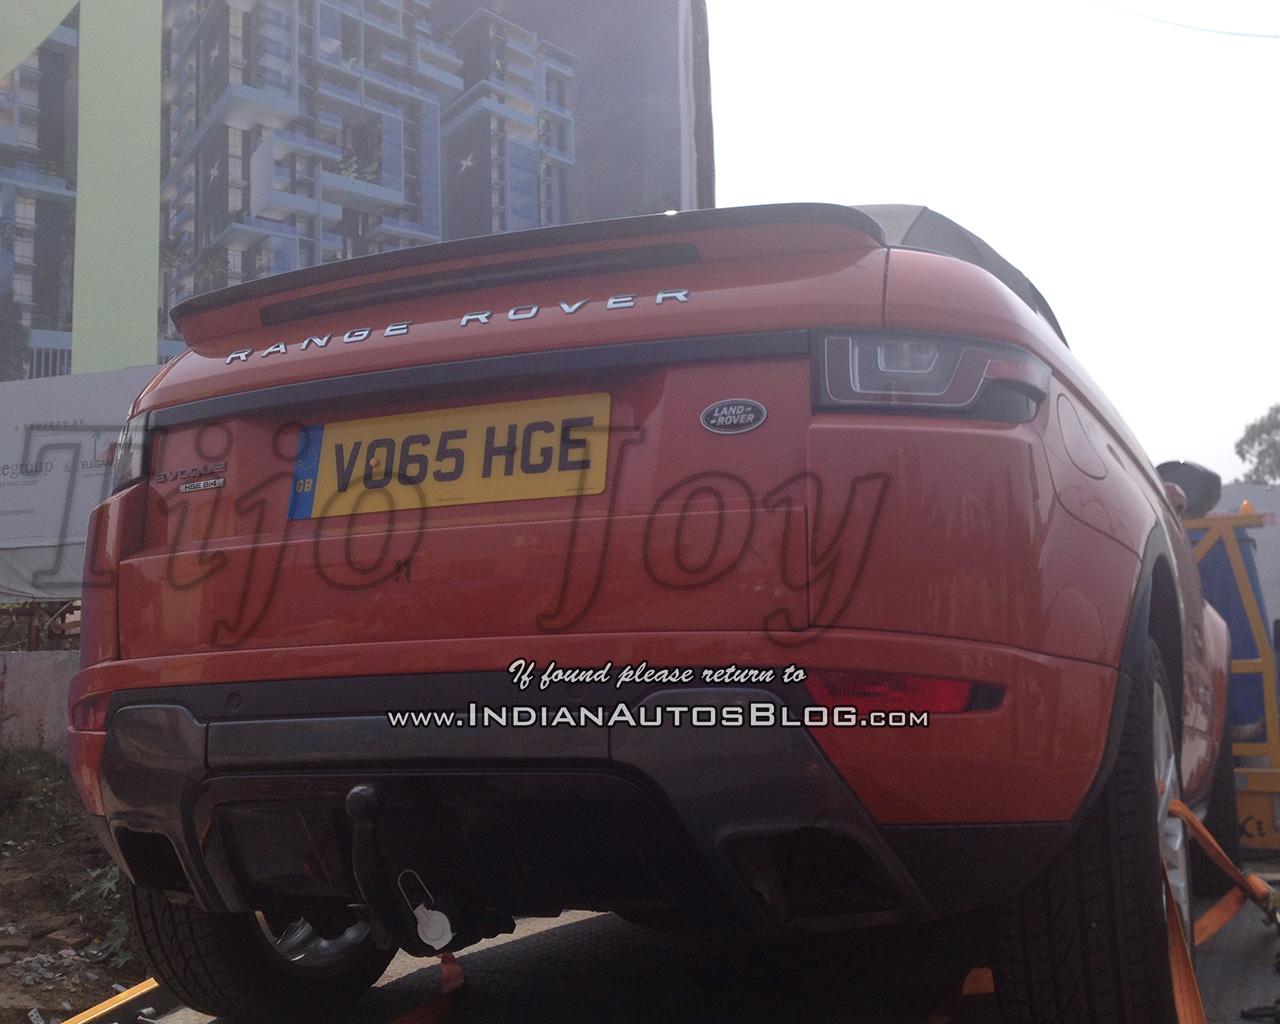 Range Rover Convertible spy (8)